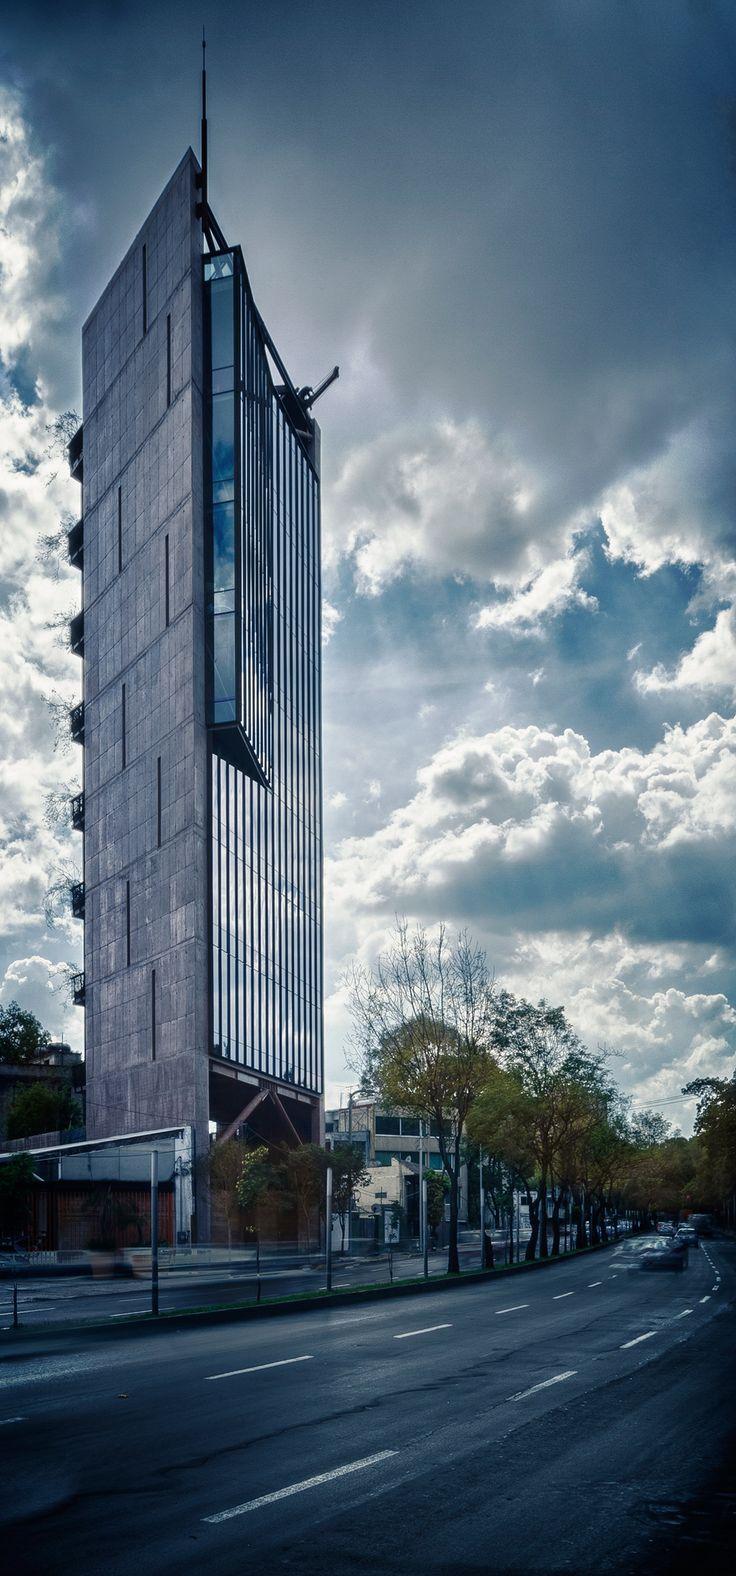 M S De 25 Ideas Incre Bles Sobre Alberto Kalach En Pinterest Edificios Edificio Multifamiliar